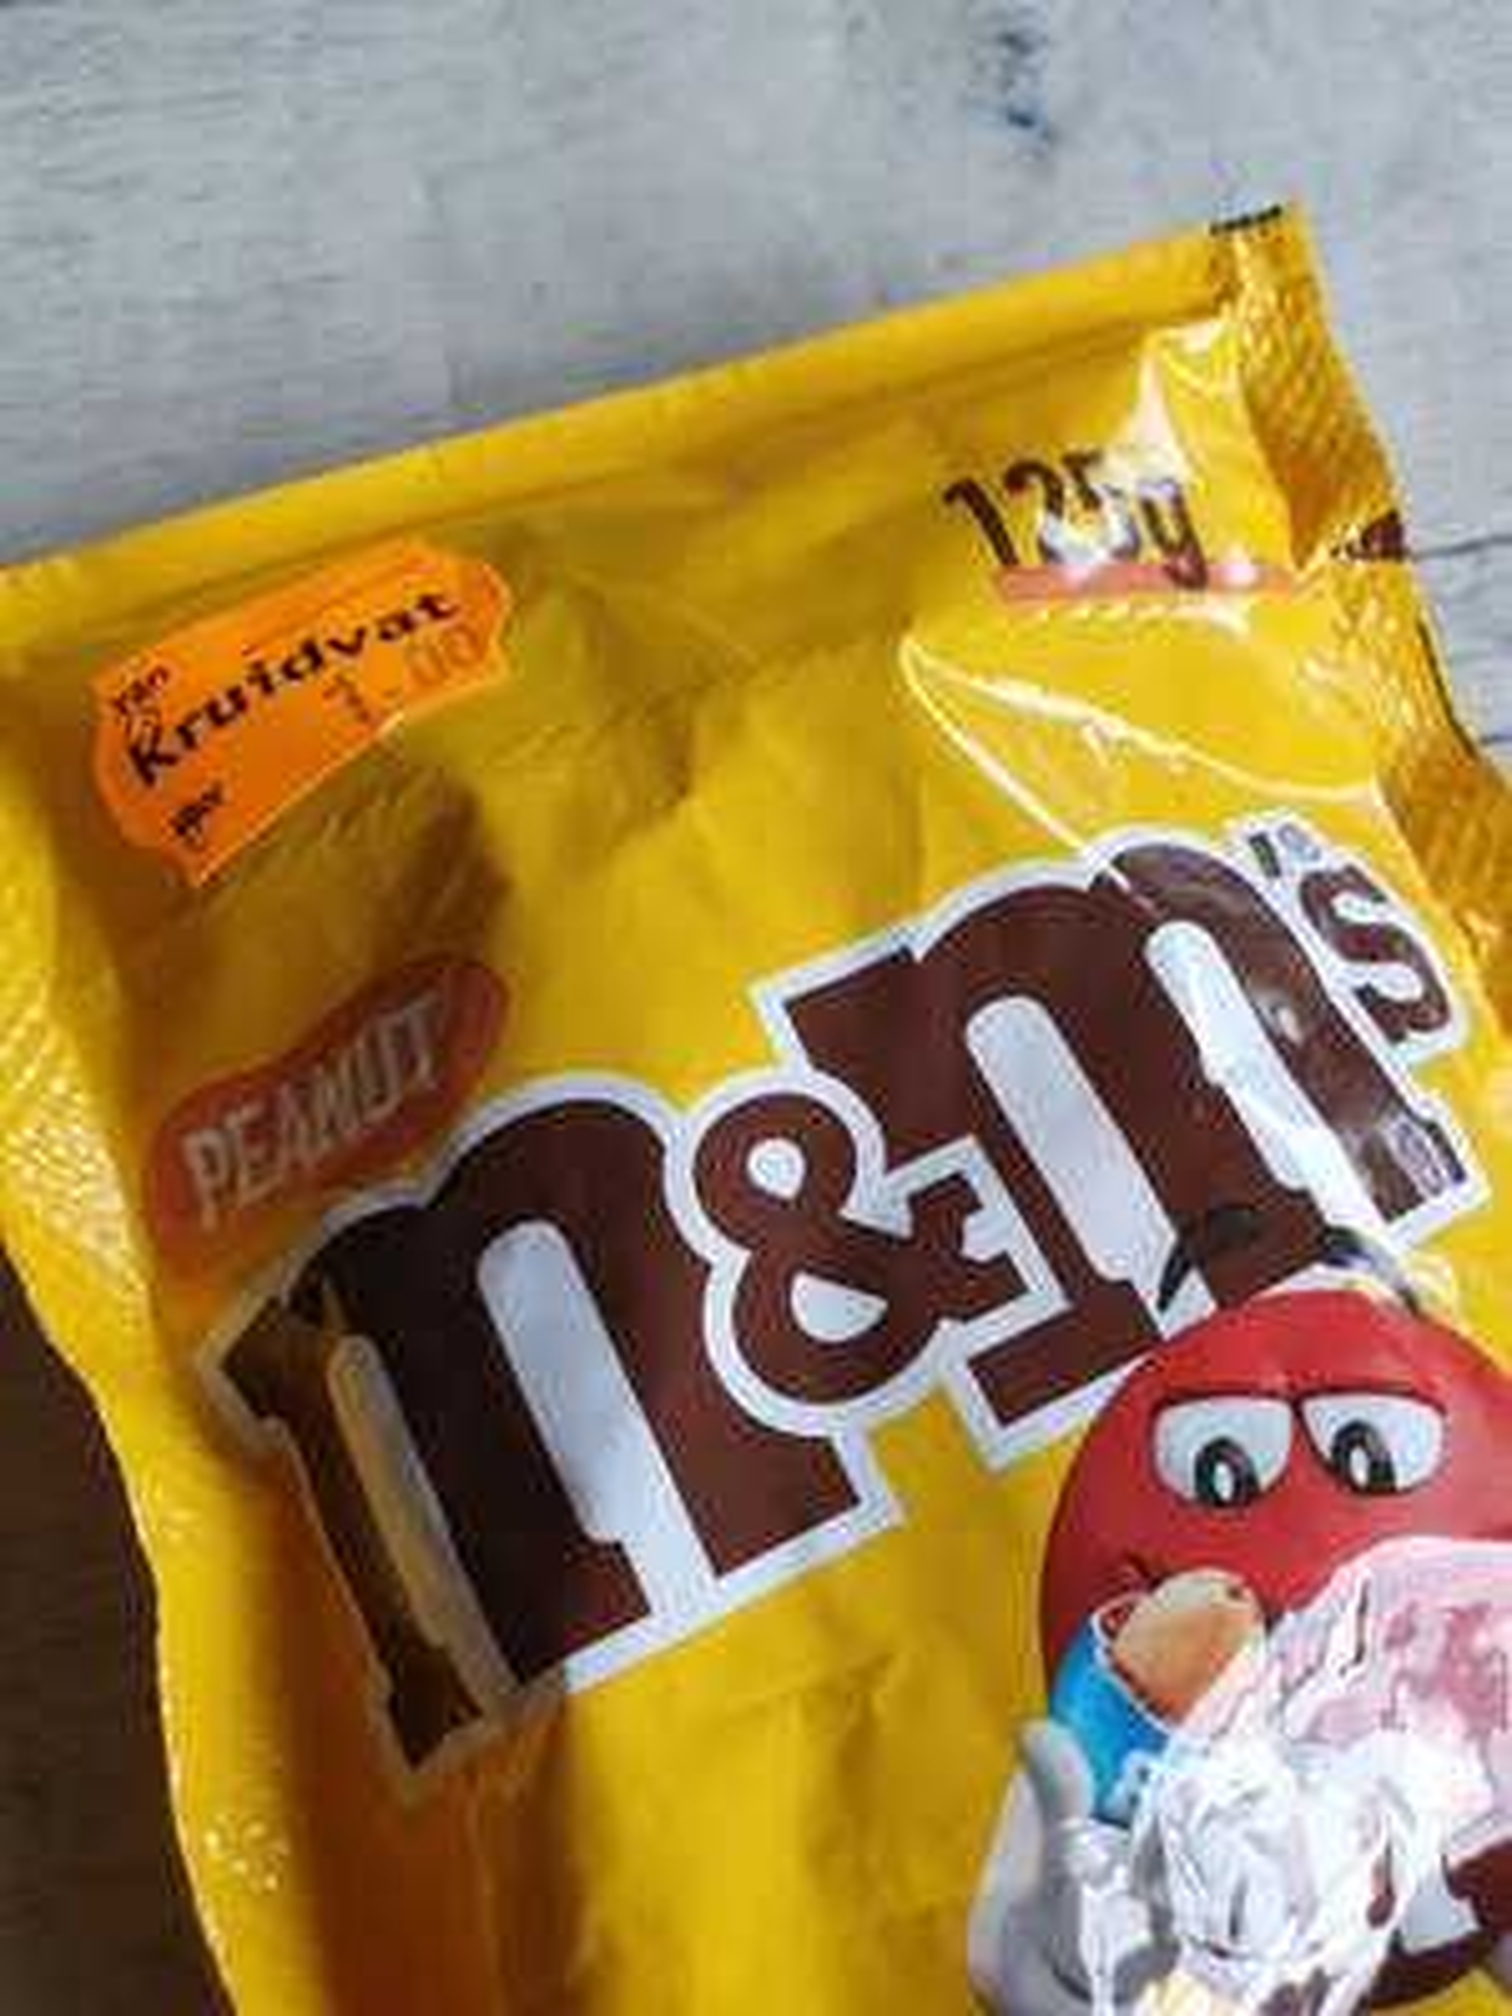 [LOKAAL] M&Ms peanut/choco (125g) @ Kruidvat